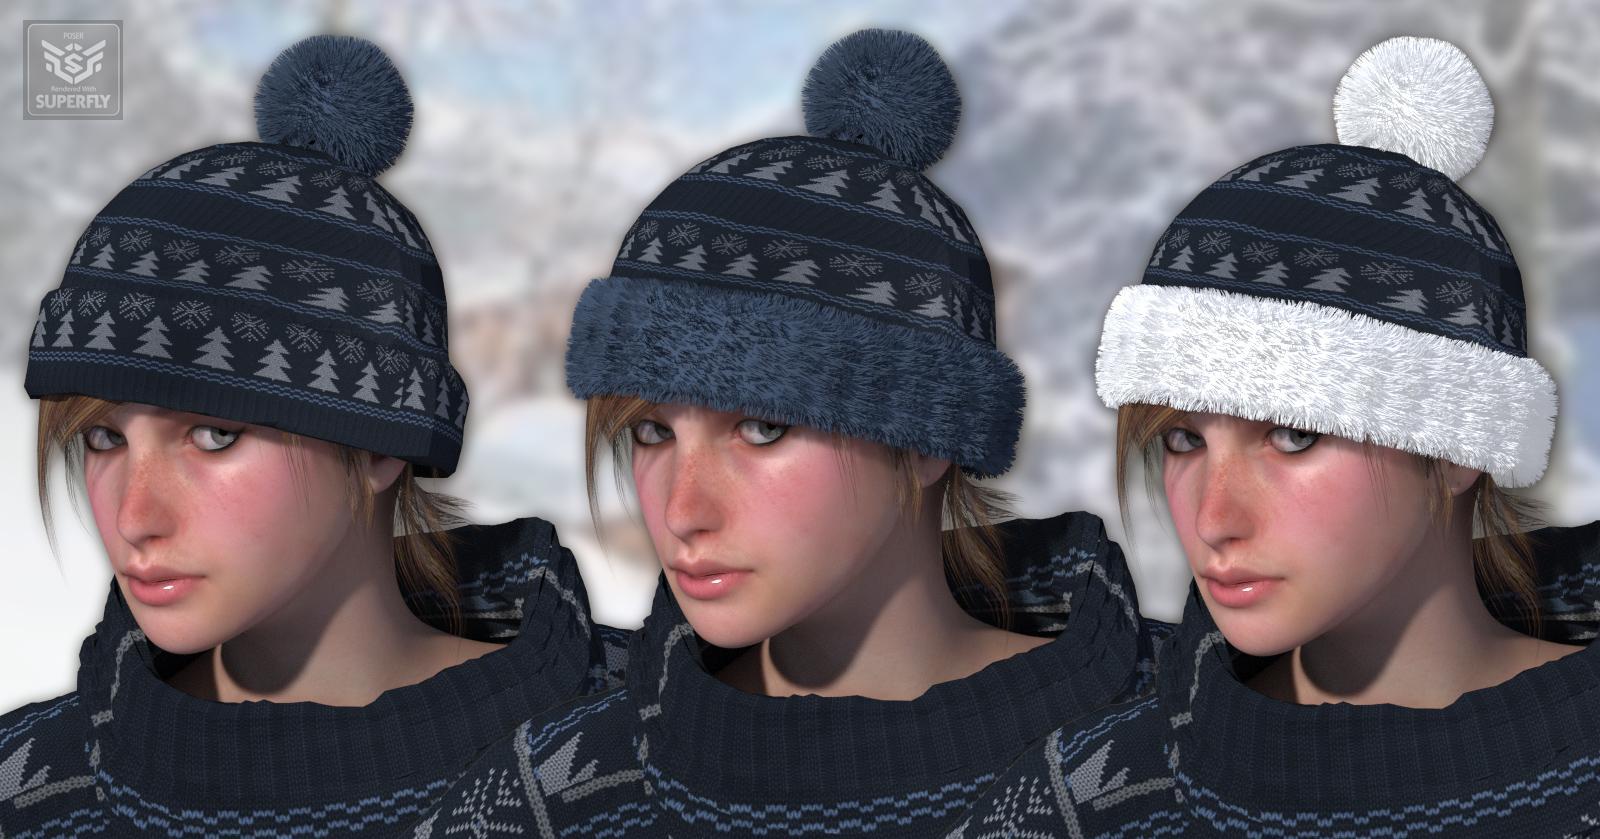 Wintercap promo 5